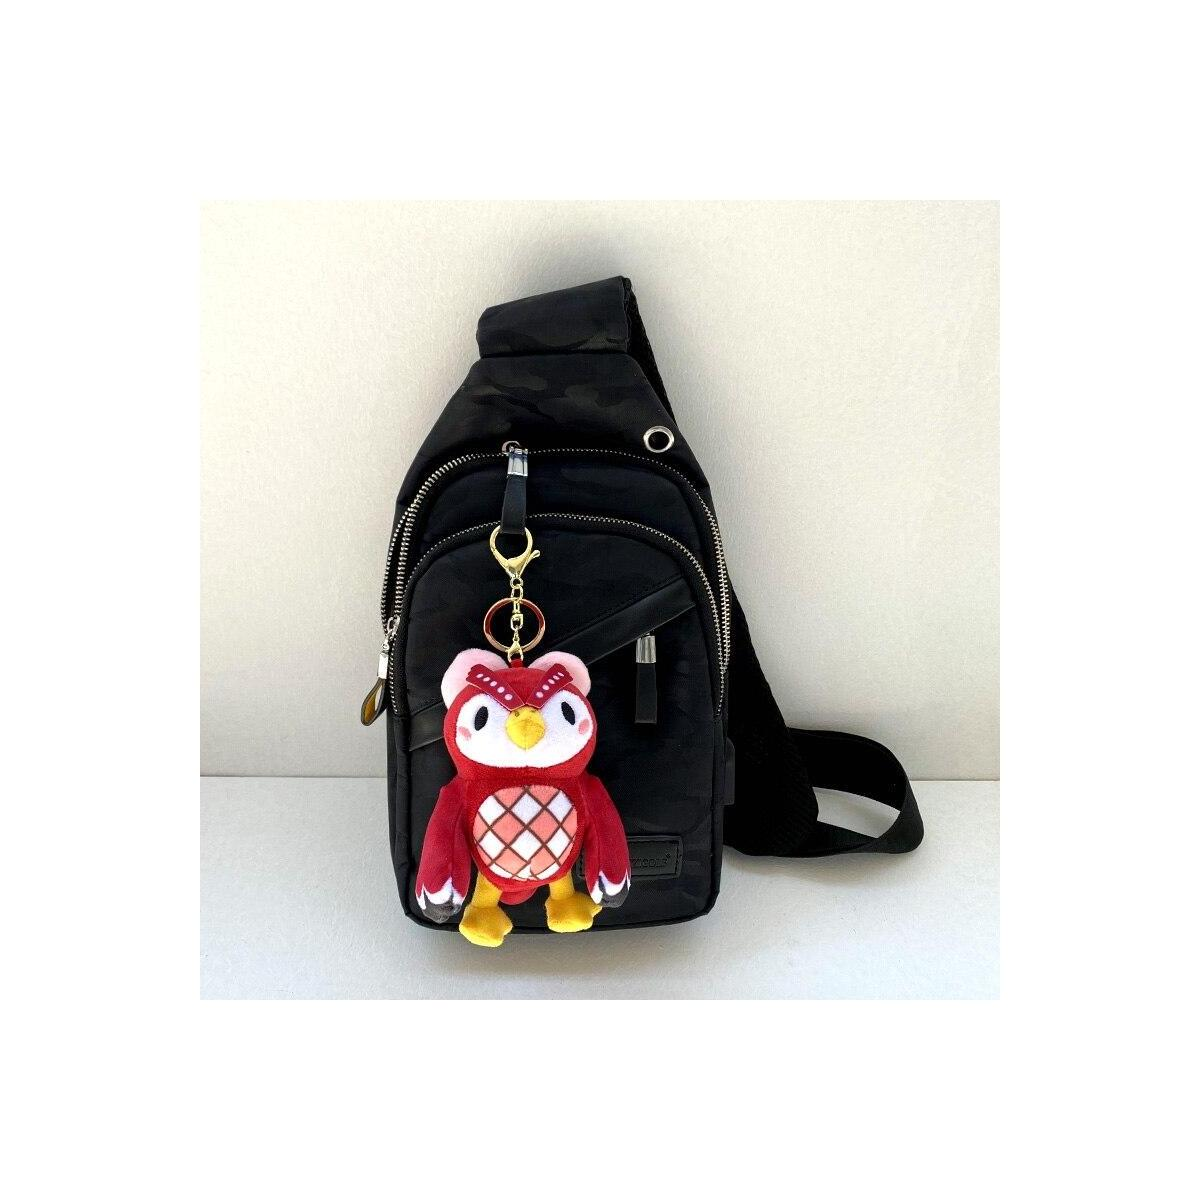 Animal Crossing Plush Villager Keychains, 12cm-Tom nook